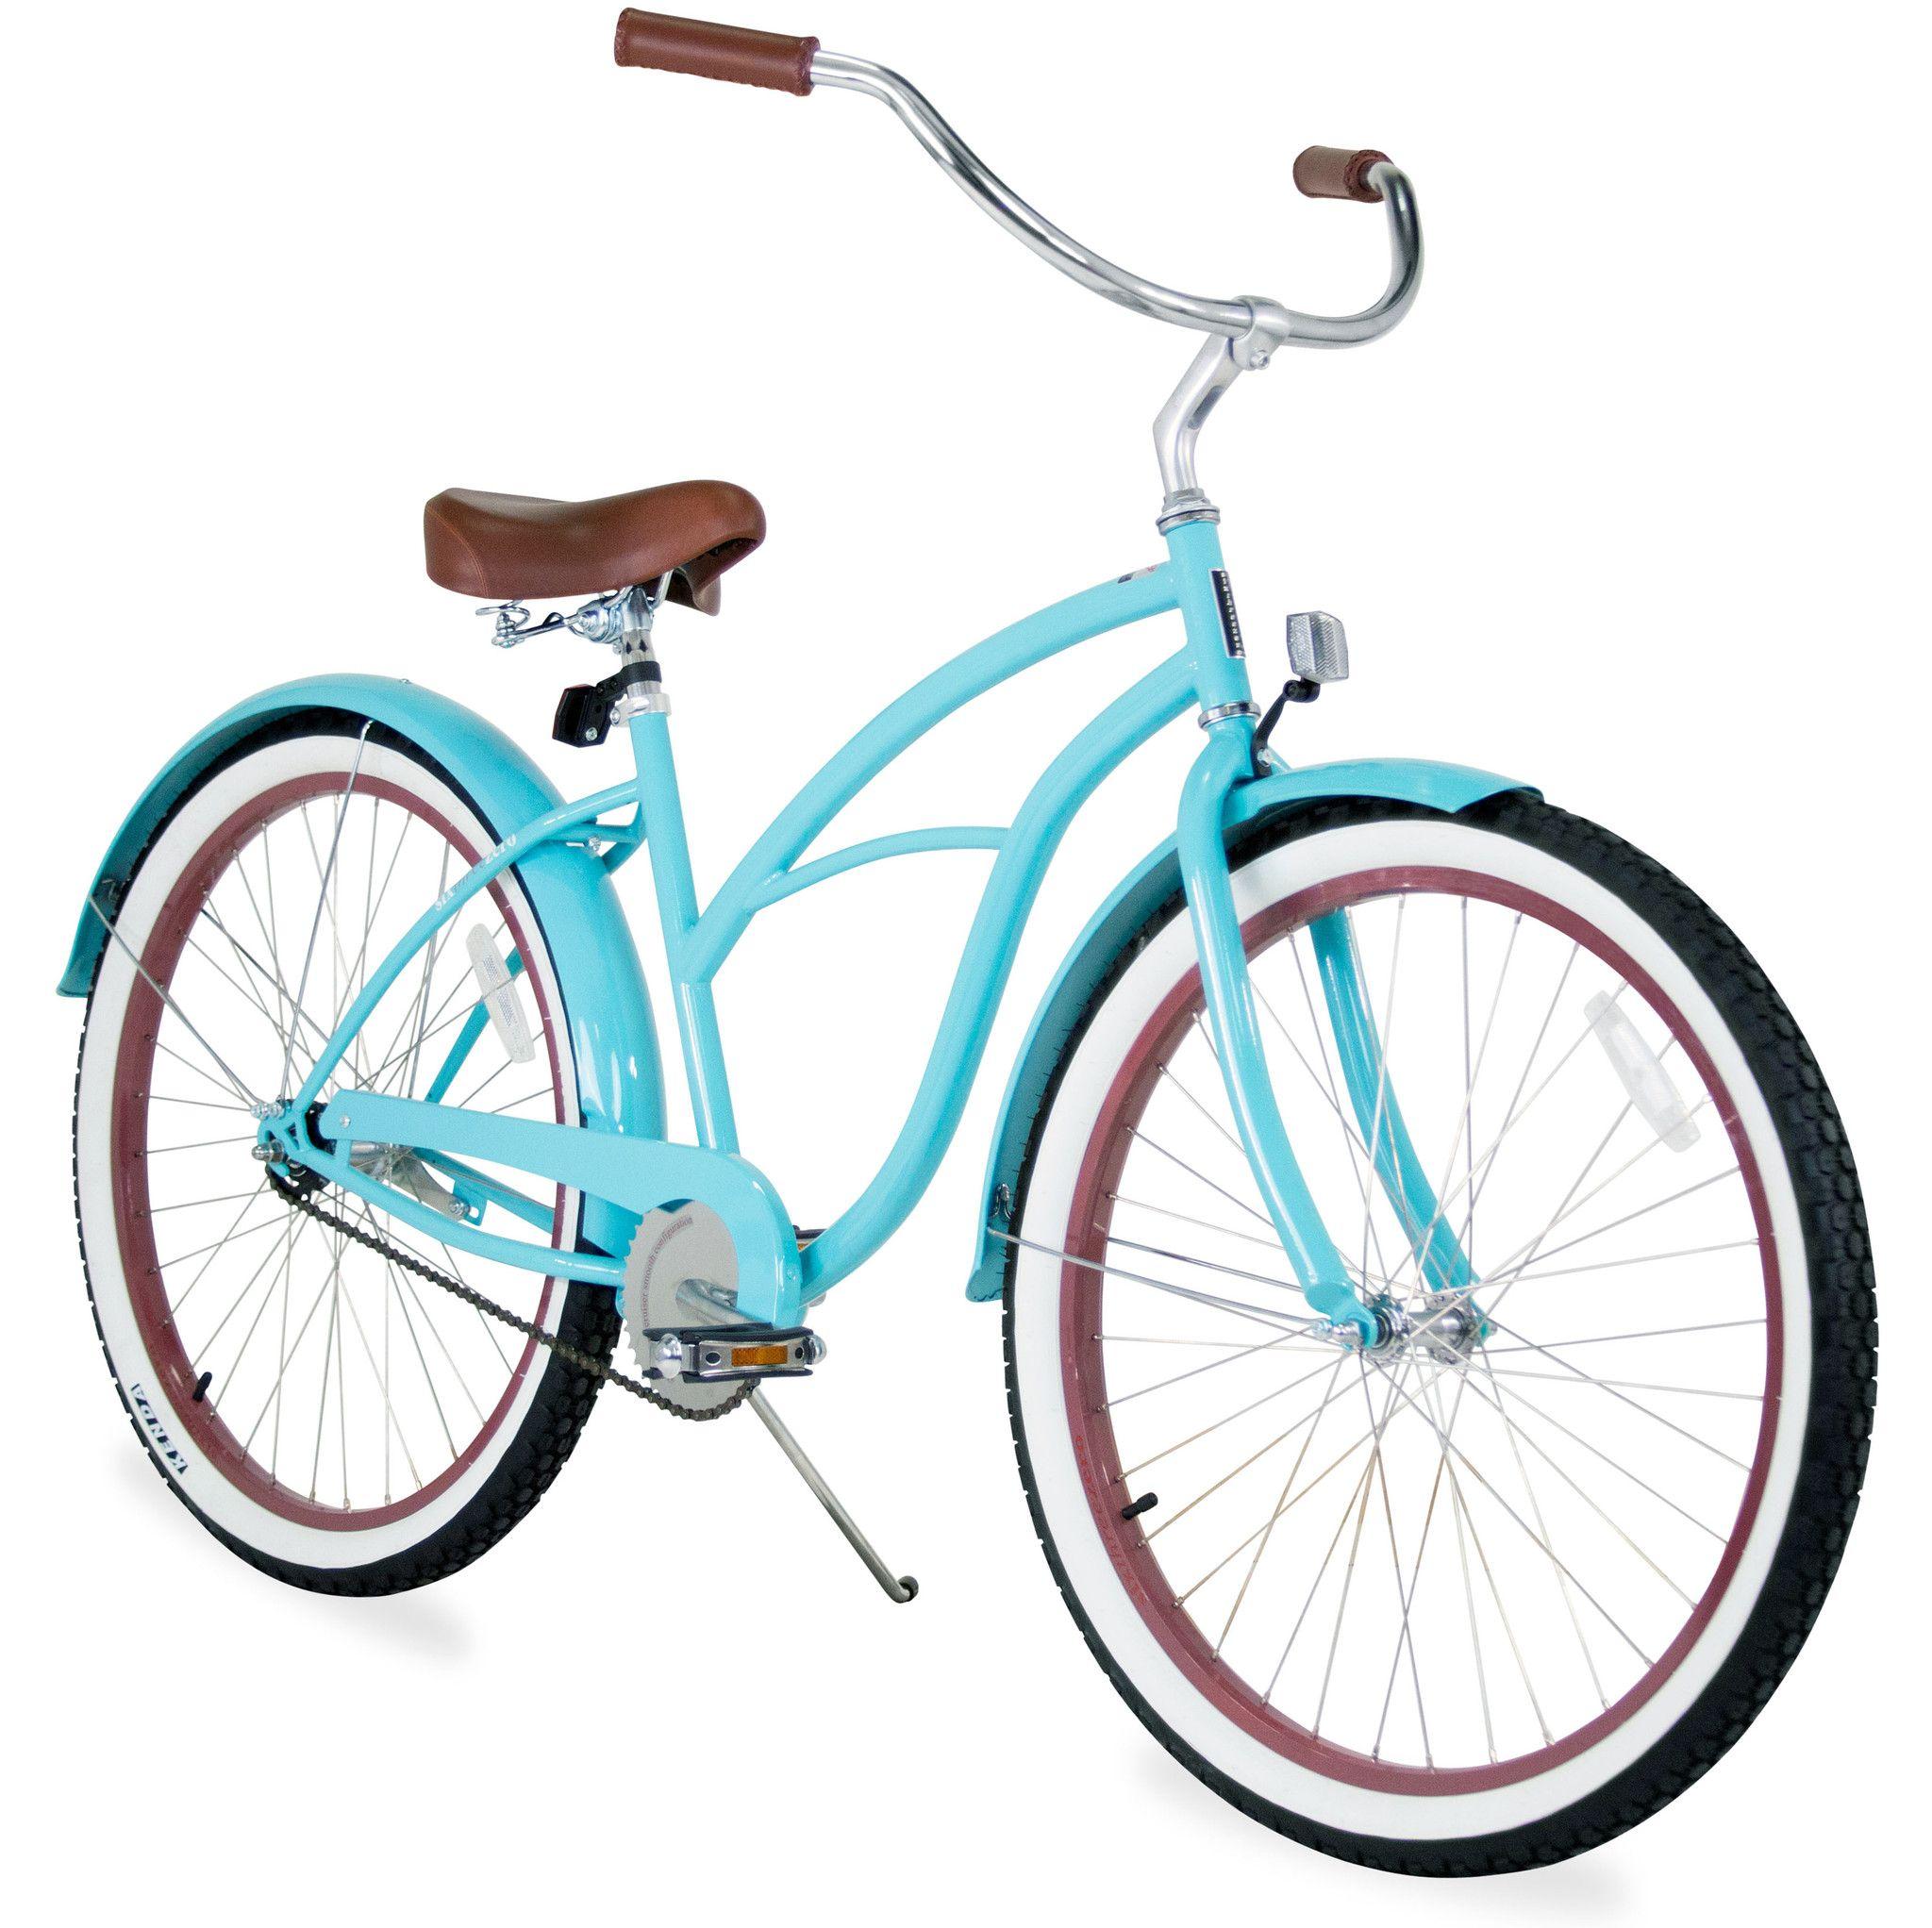 Sixthreezero Teal Single Speed Women S Beach Cruiser Bike Beach Cruiser Bicycle Cruiser Bicycle Beach Cruiser Bike